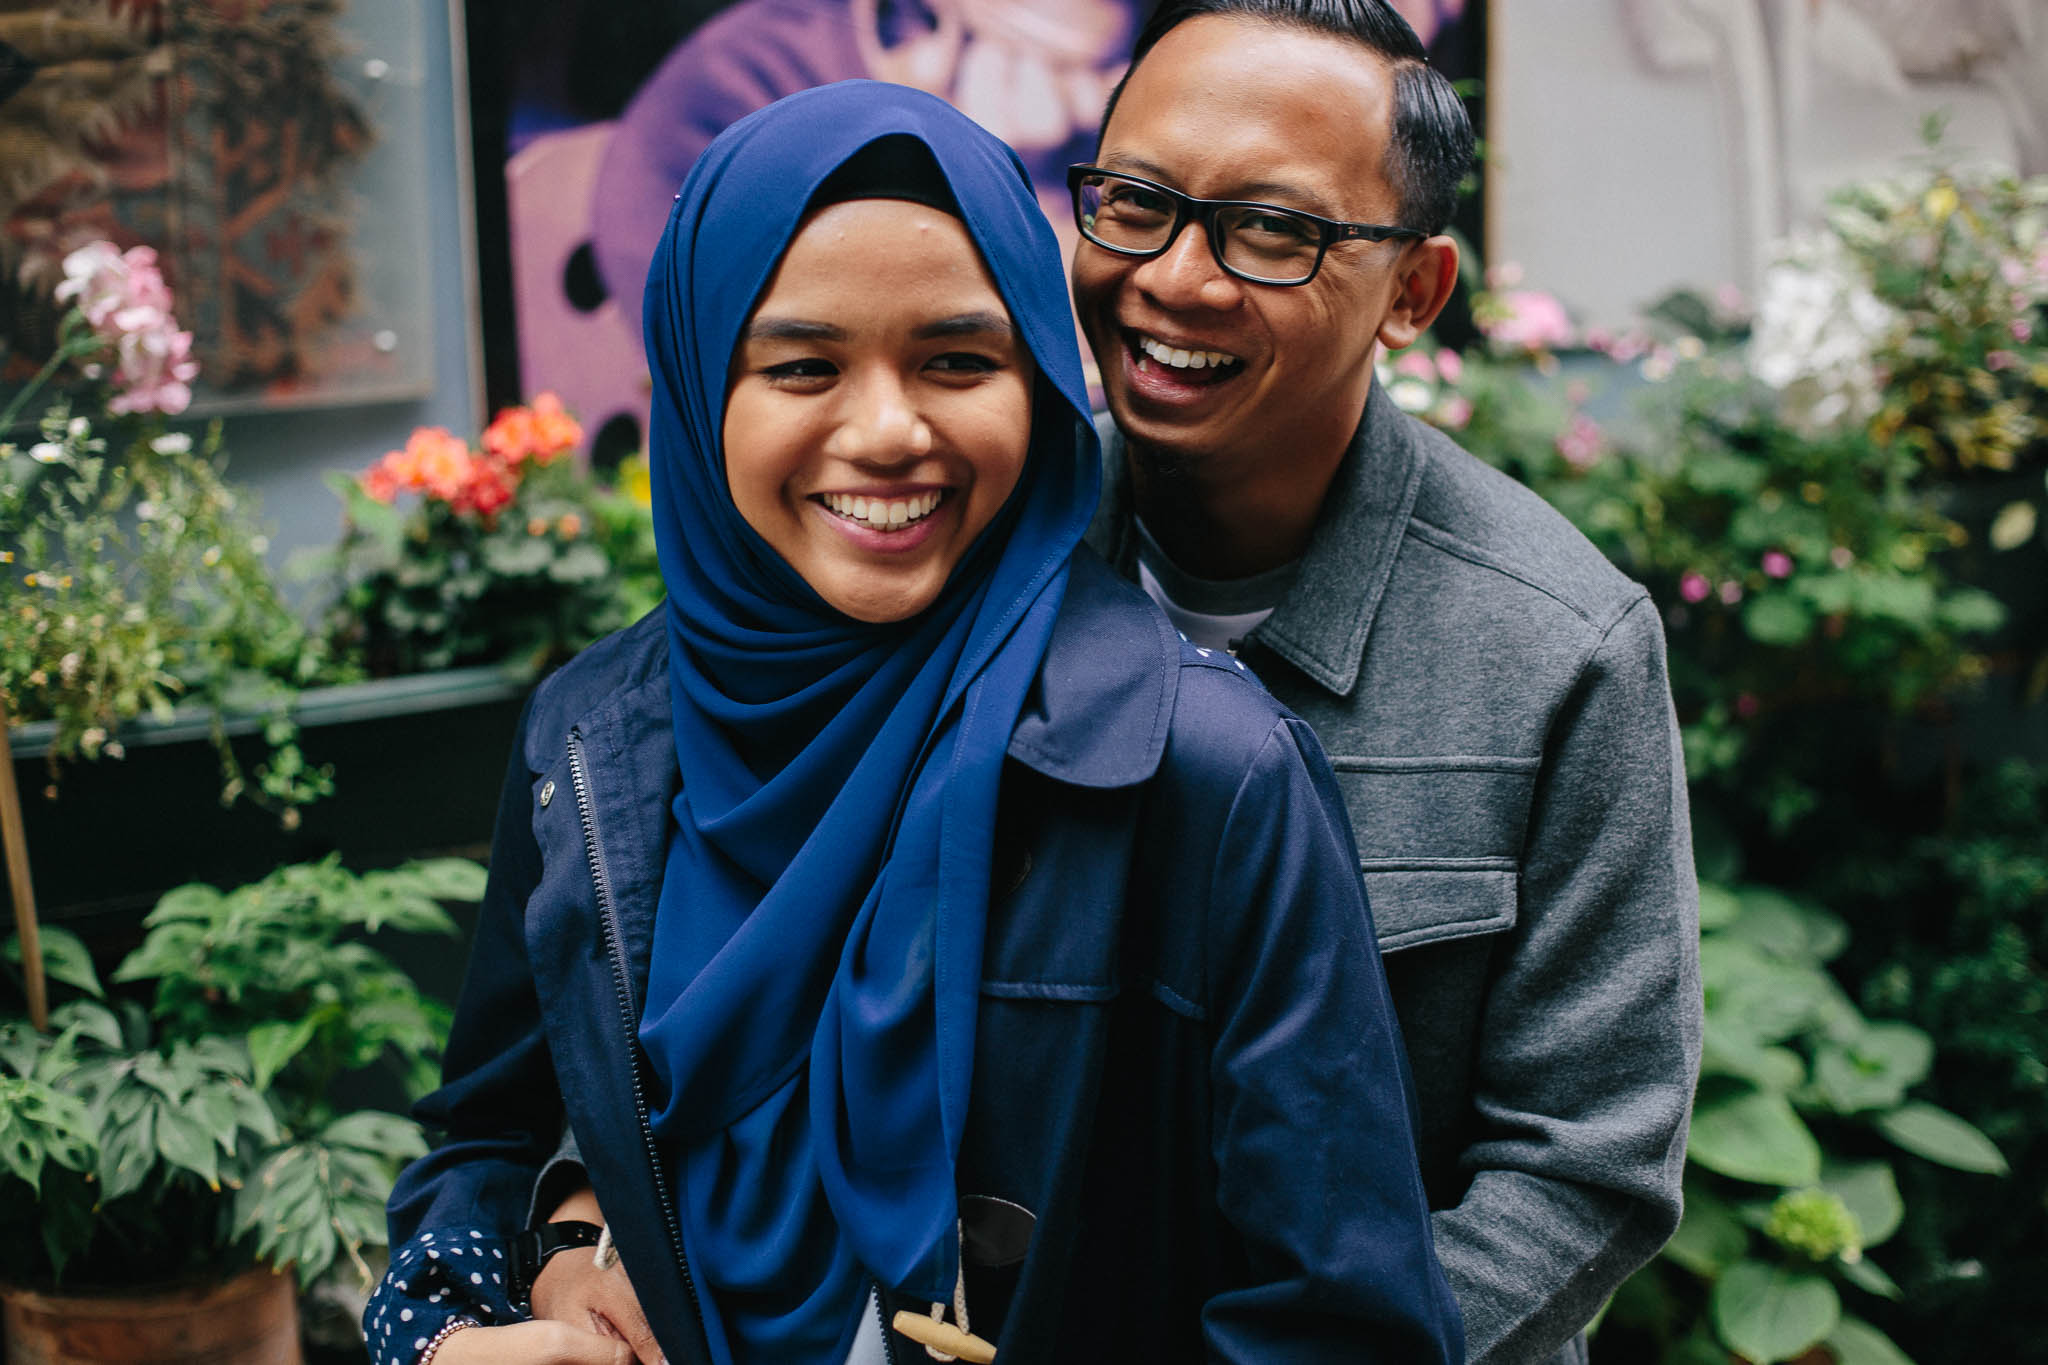 singapore-wedding-photographer-dzul-isma-istanbul-32.jpg